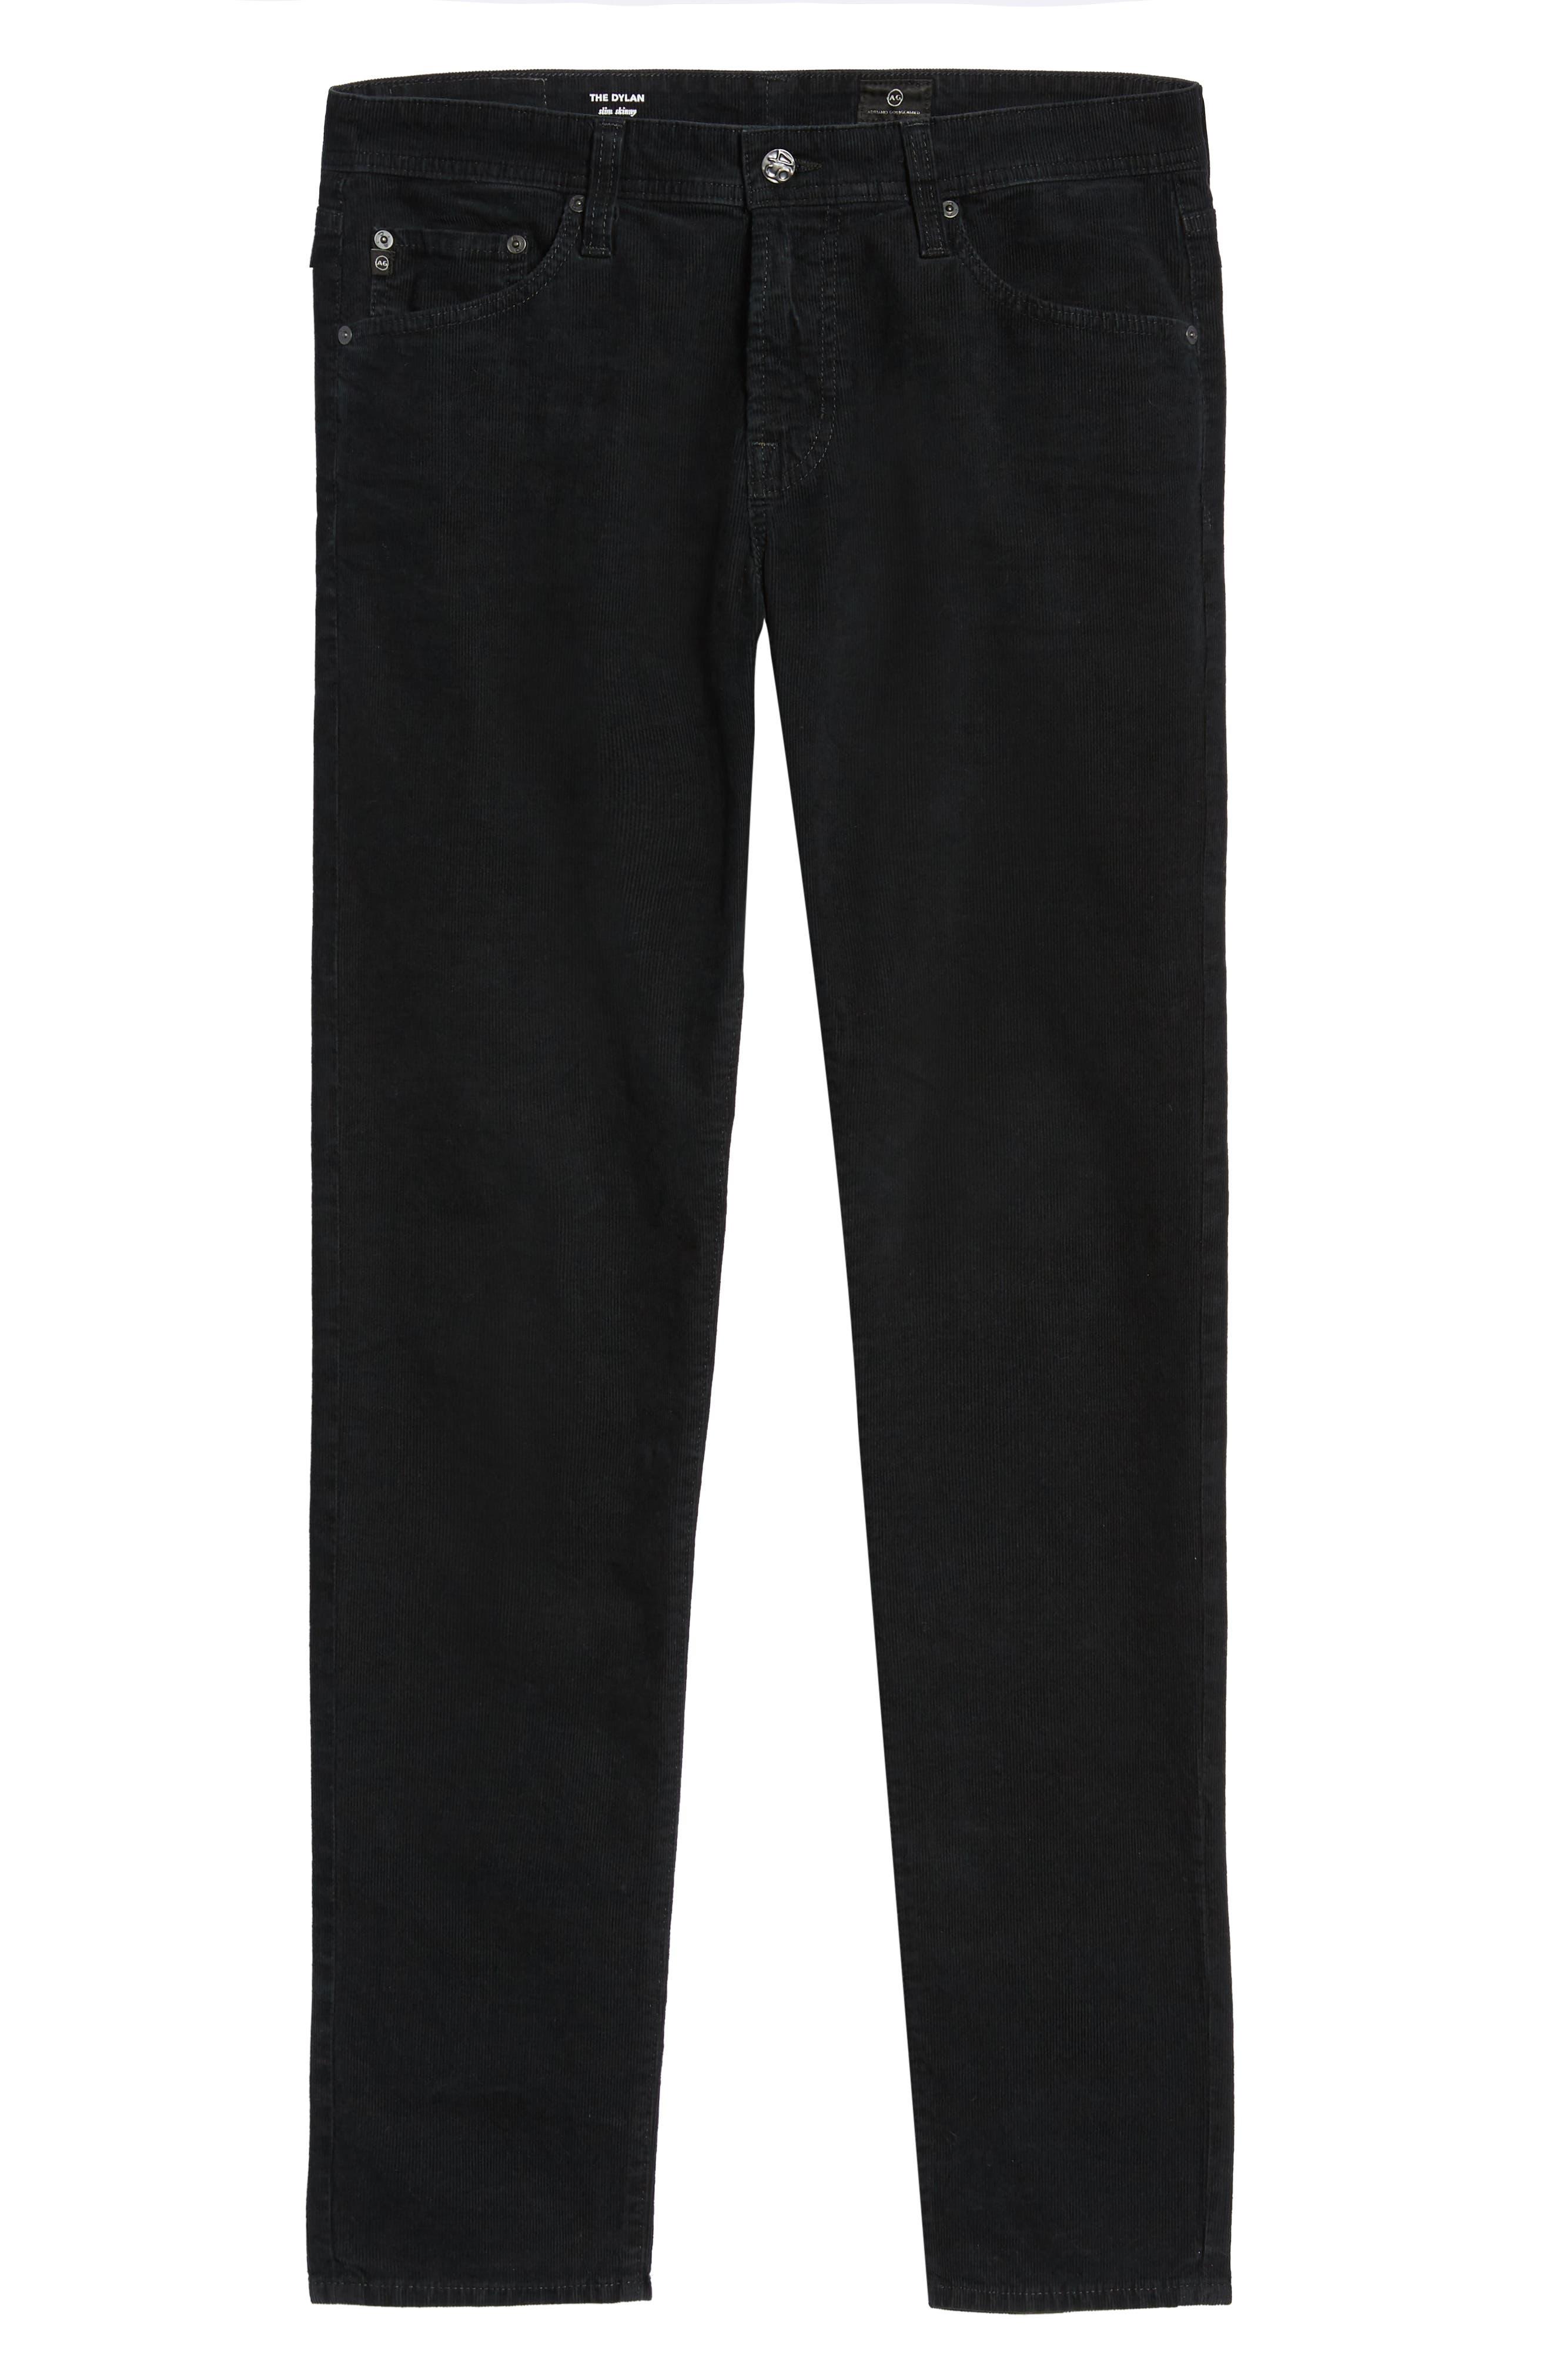 Dylan Skinny Fit Corduroy Pants,                             Alternate thumbnail 6, color,                             SULFUR ASH BLACK